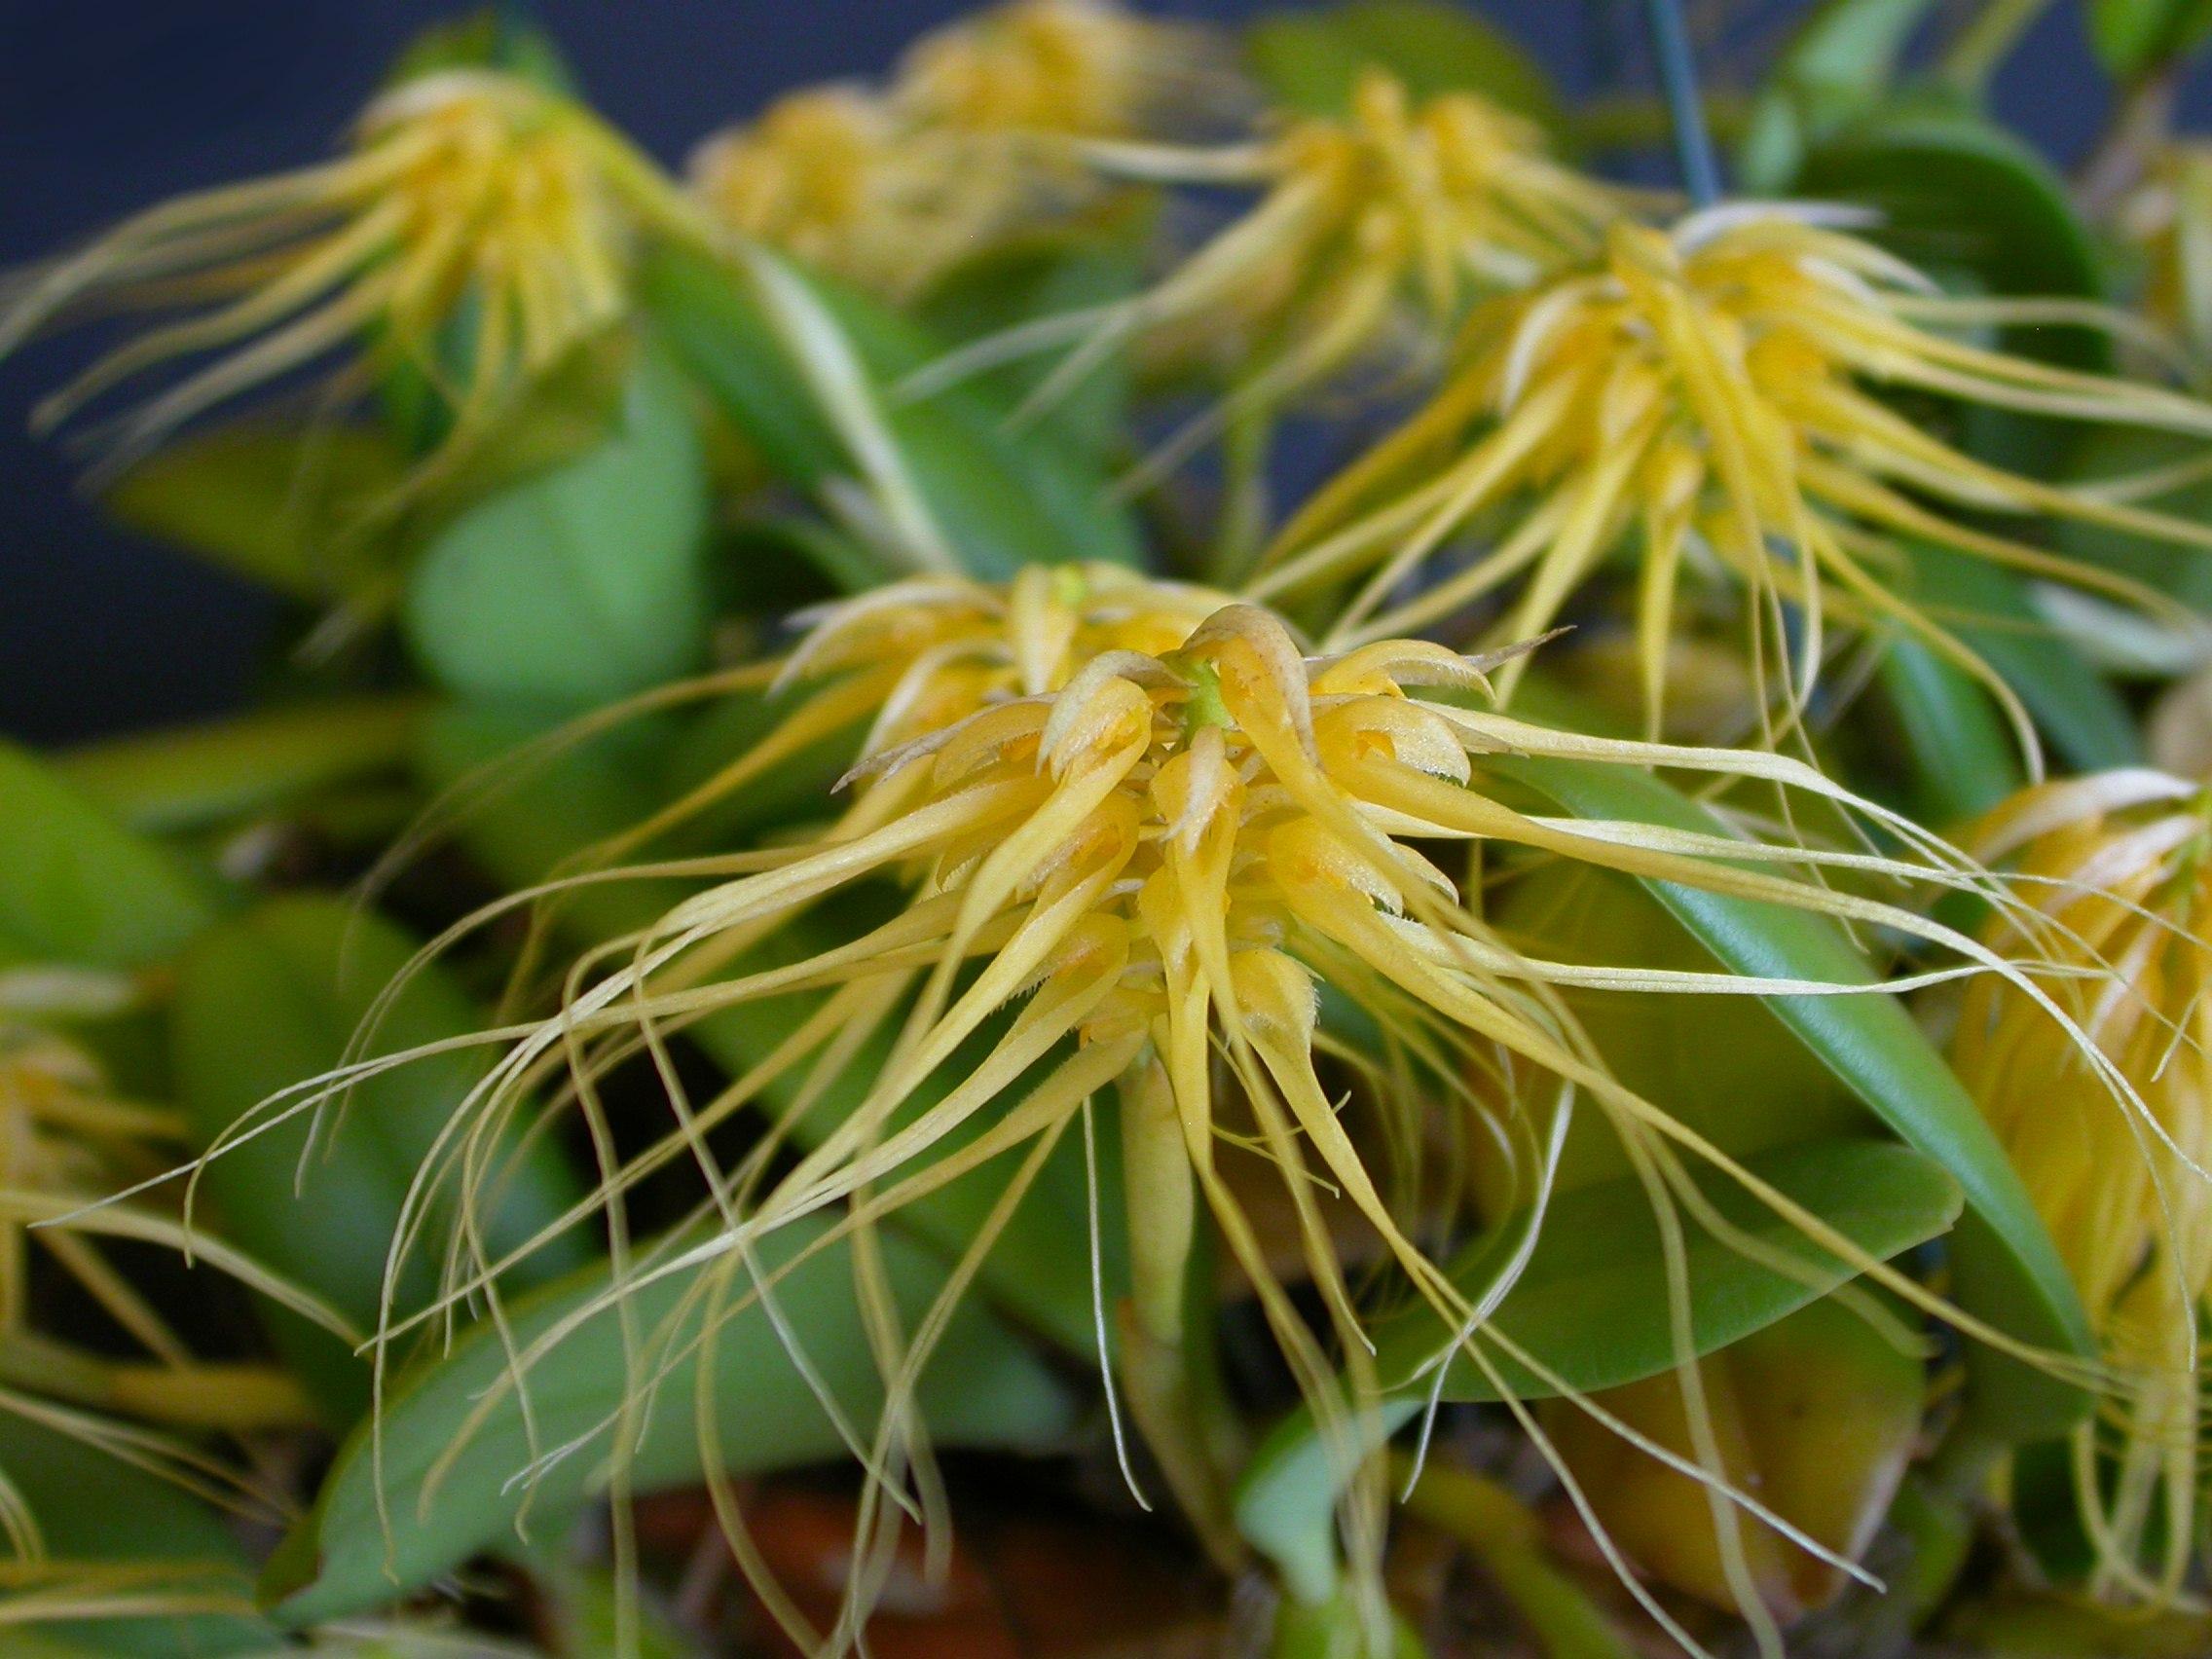 http://upload.wikimedia.org/wikipedia/commons/c/cf/Bulbophyllum_vaginatum_5.jpg